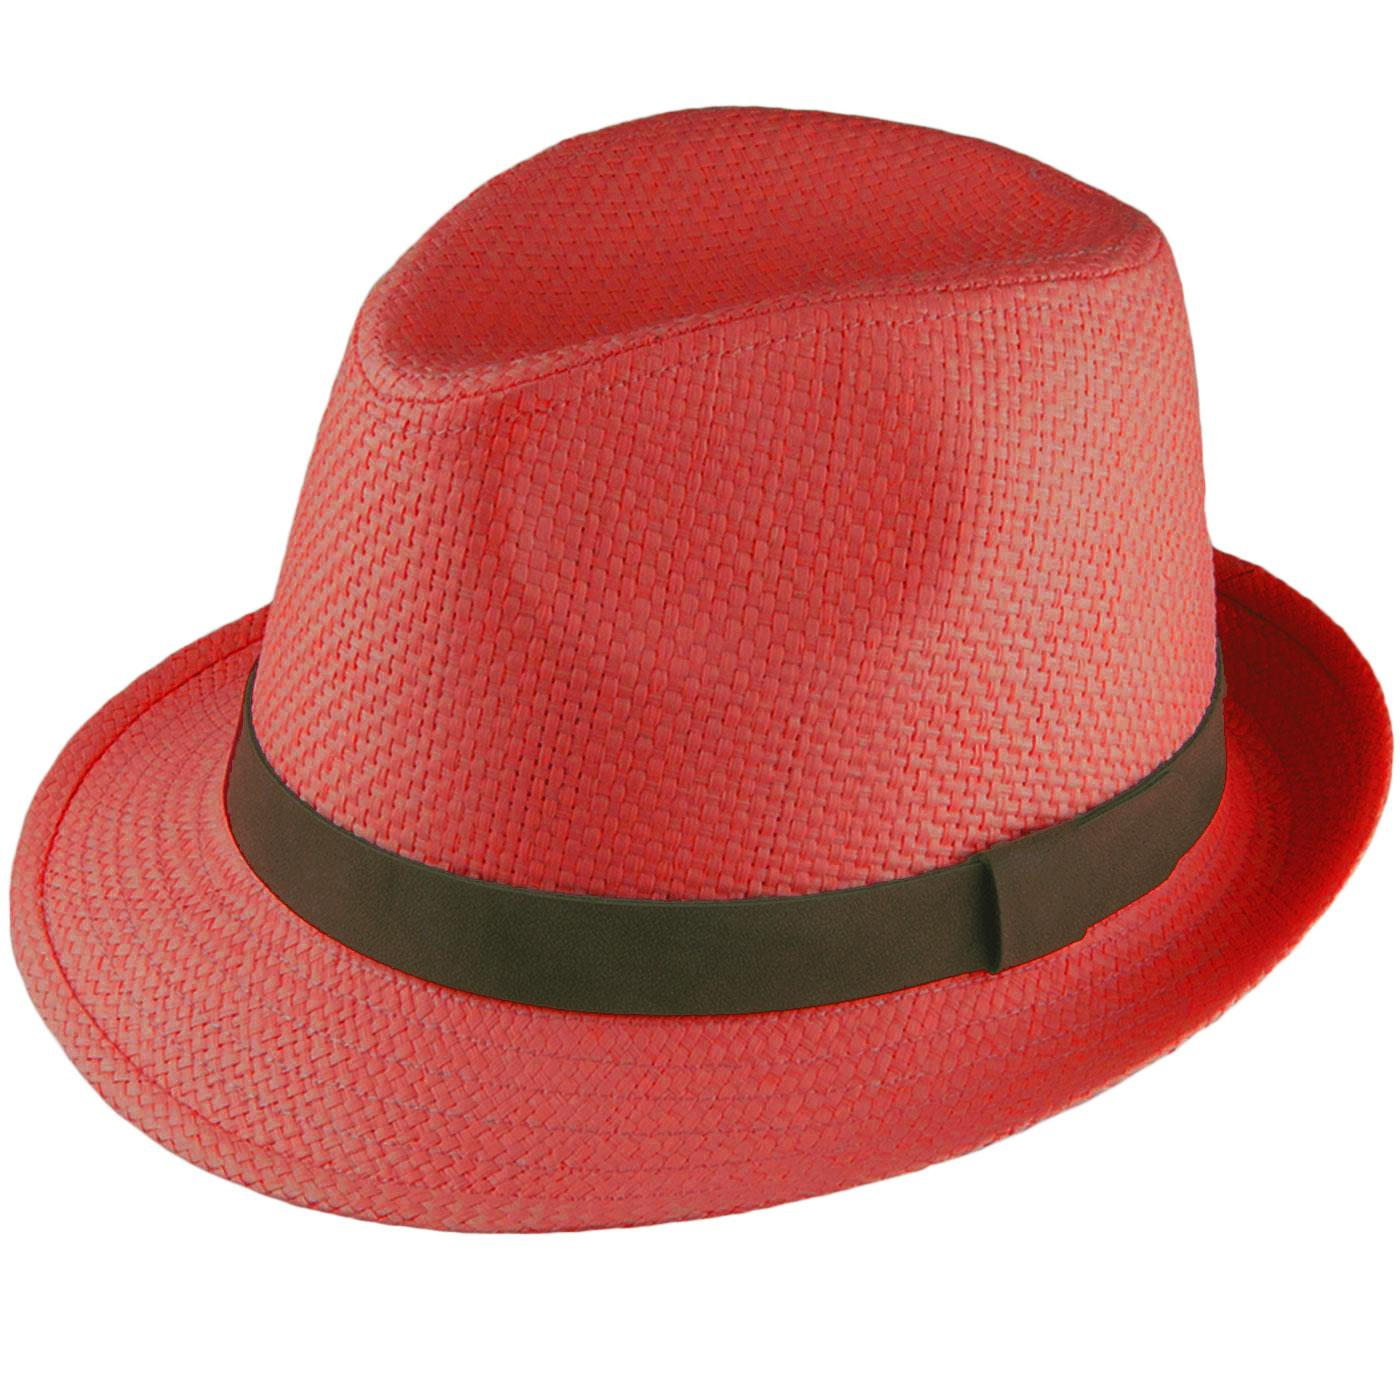 FAILSWORTH Men's Retro 70s Straw Trilby Hat (Red)